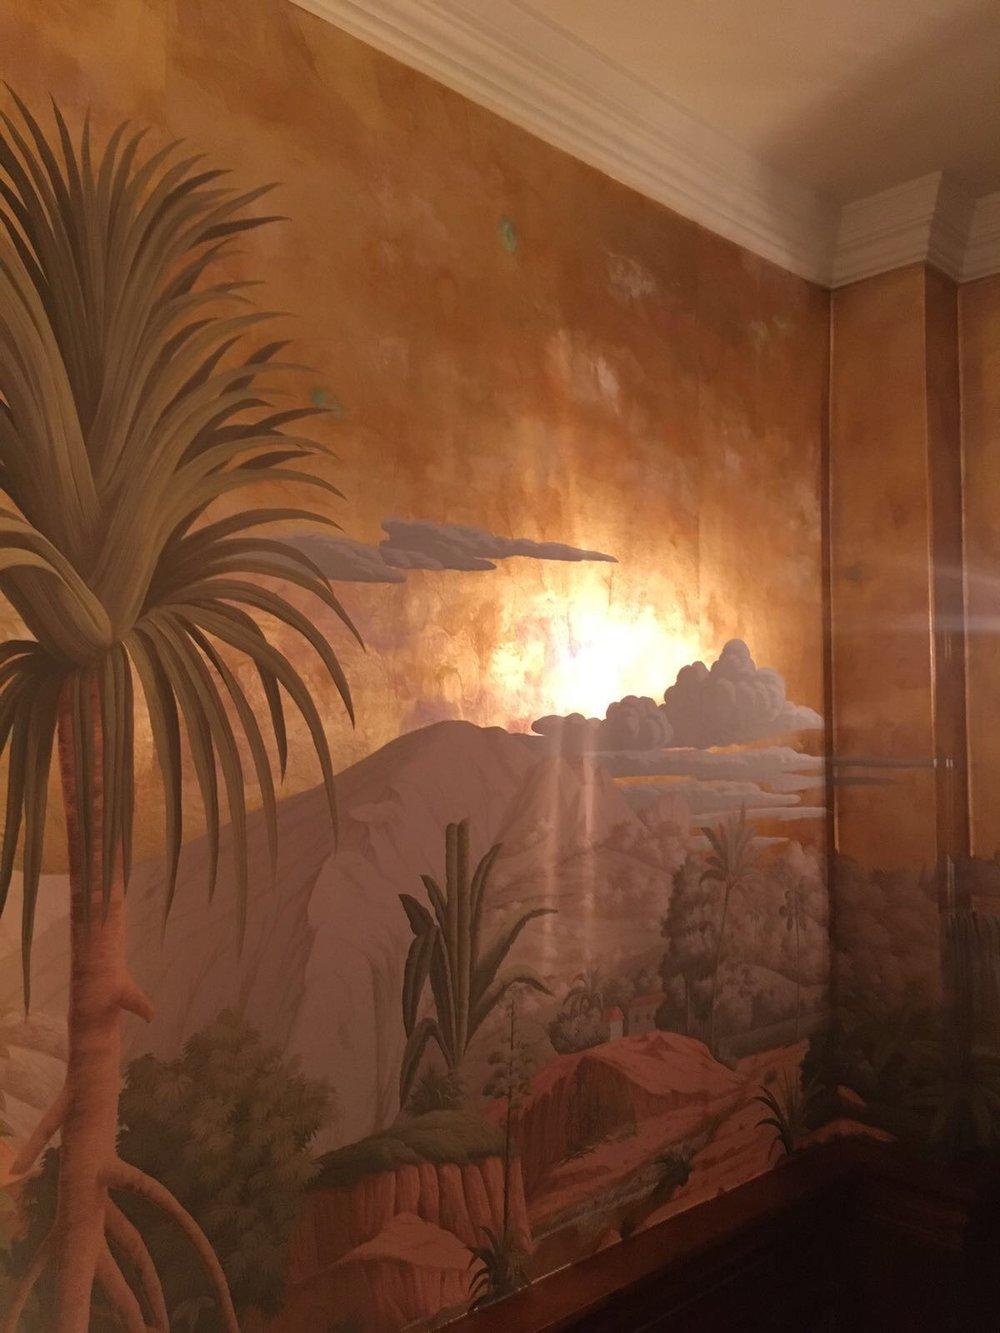 Bespoke golden wallpaper